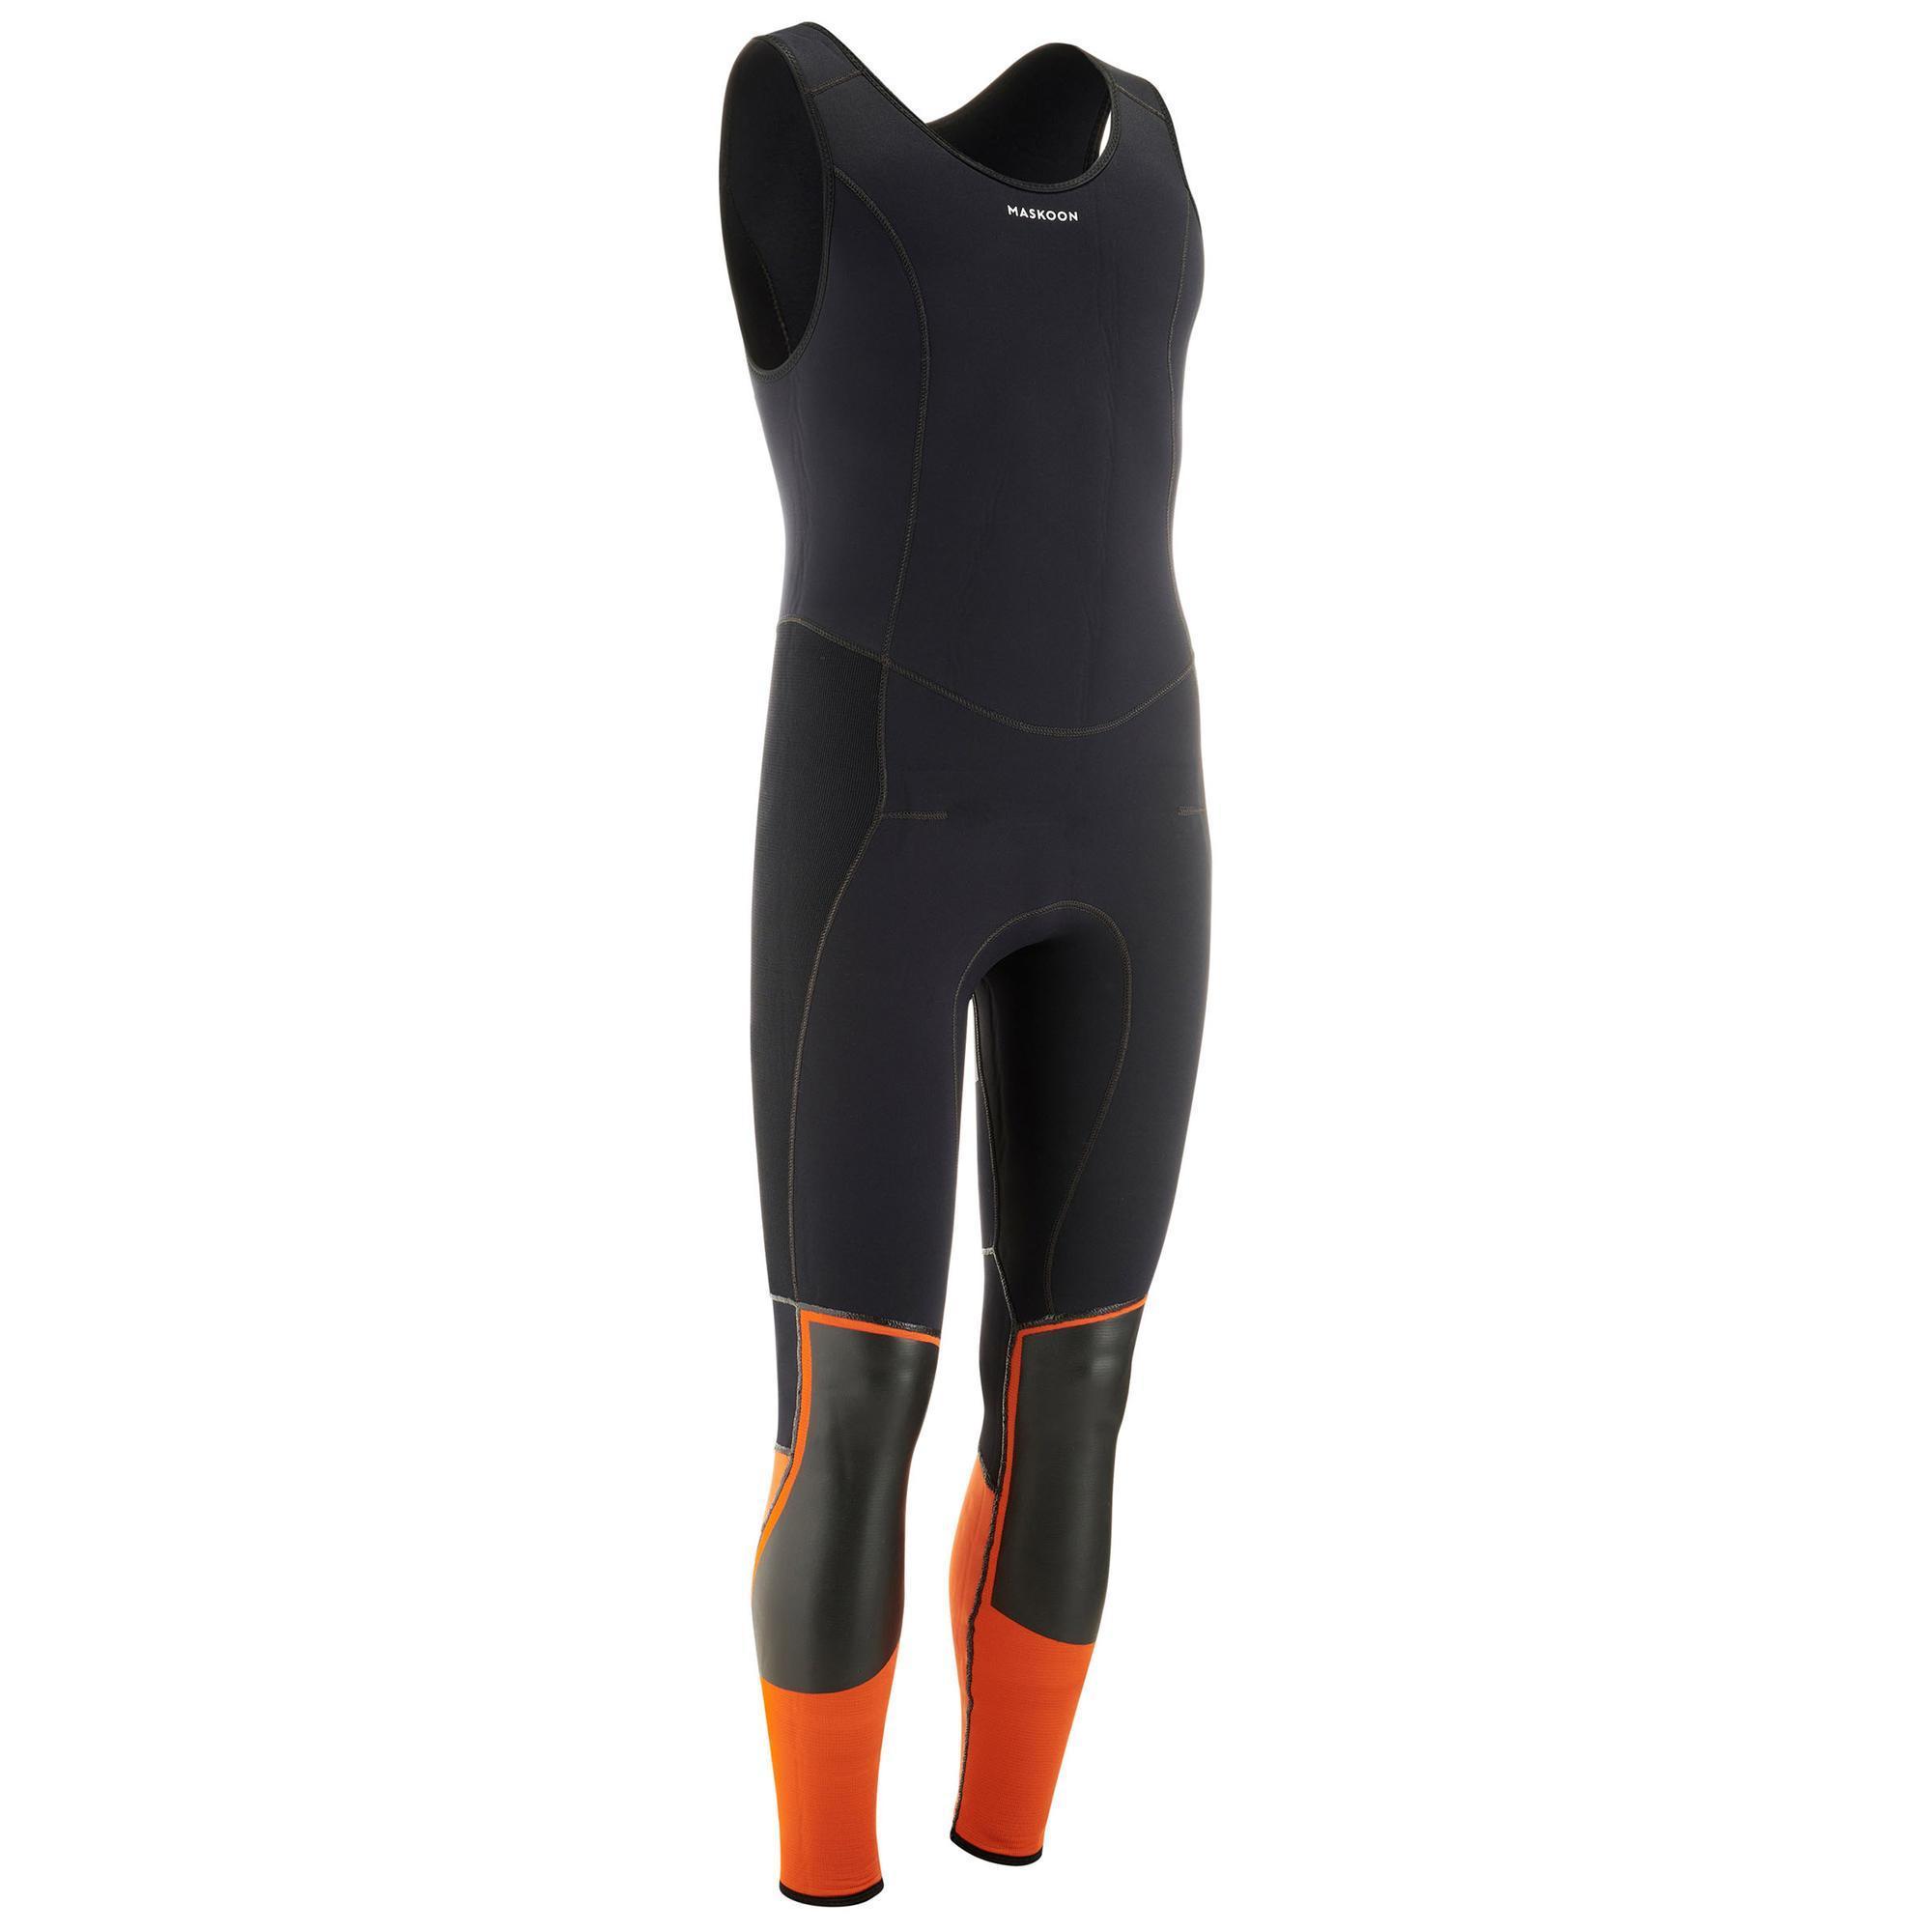 Long John Neoprenanzug Canyoning 5mm Erwachsene | Sportbekleidung > Sportanzüge | Maskoon